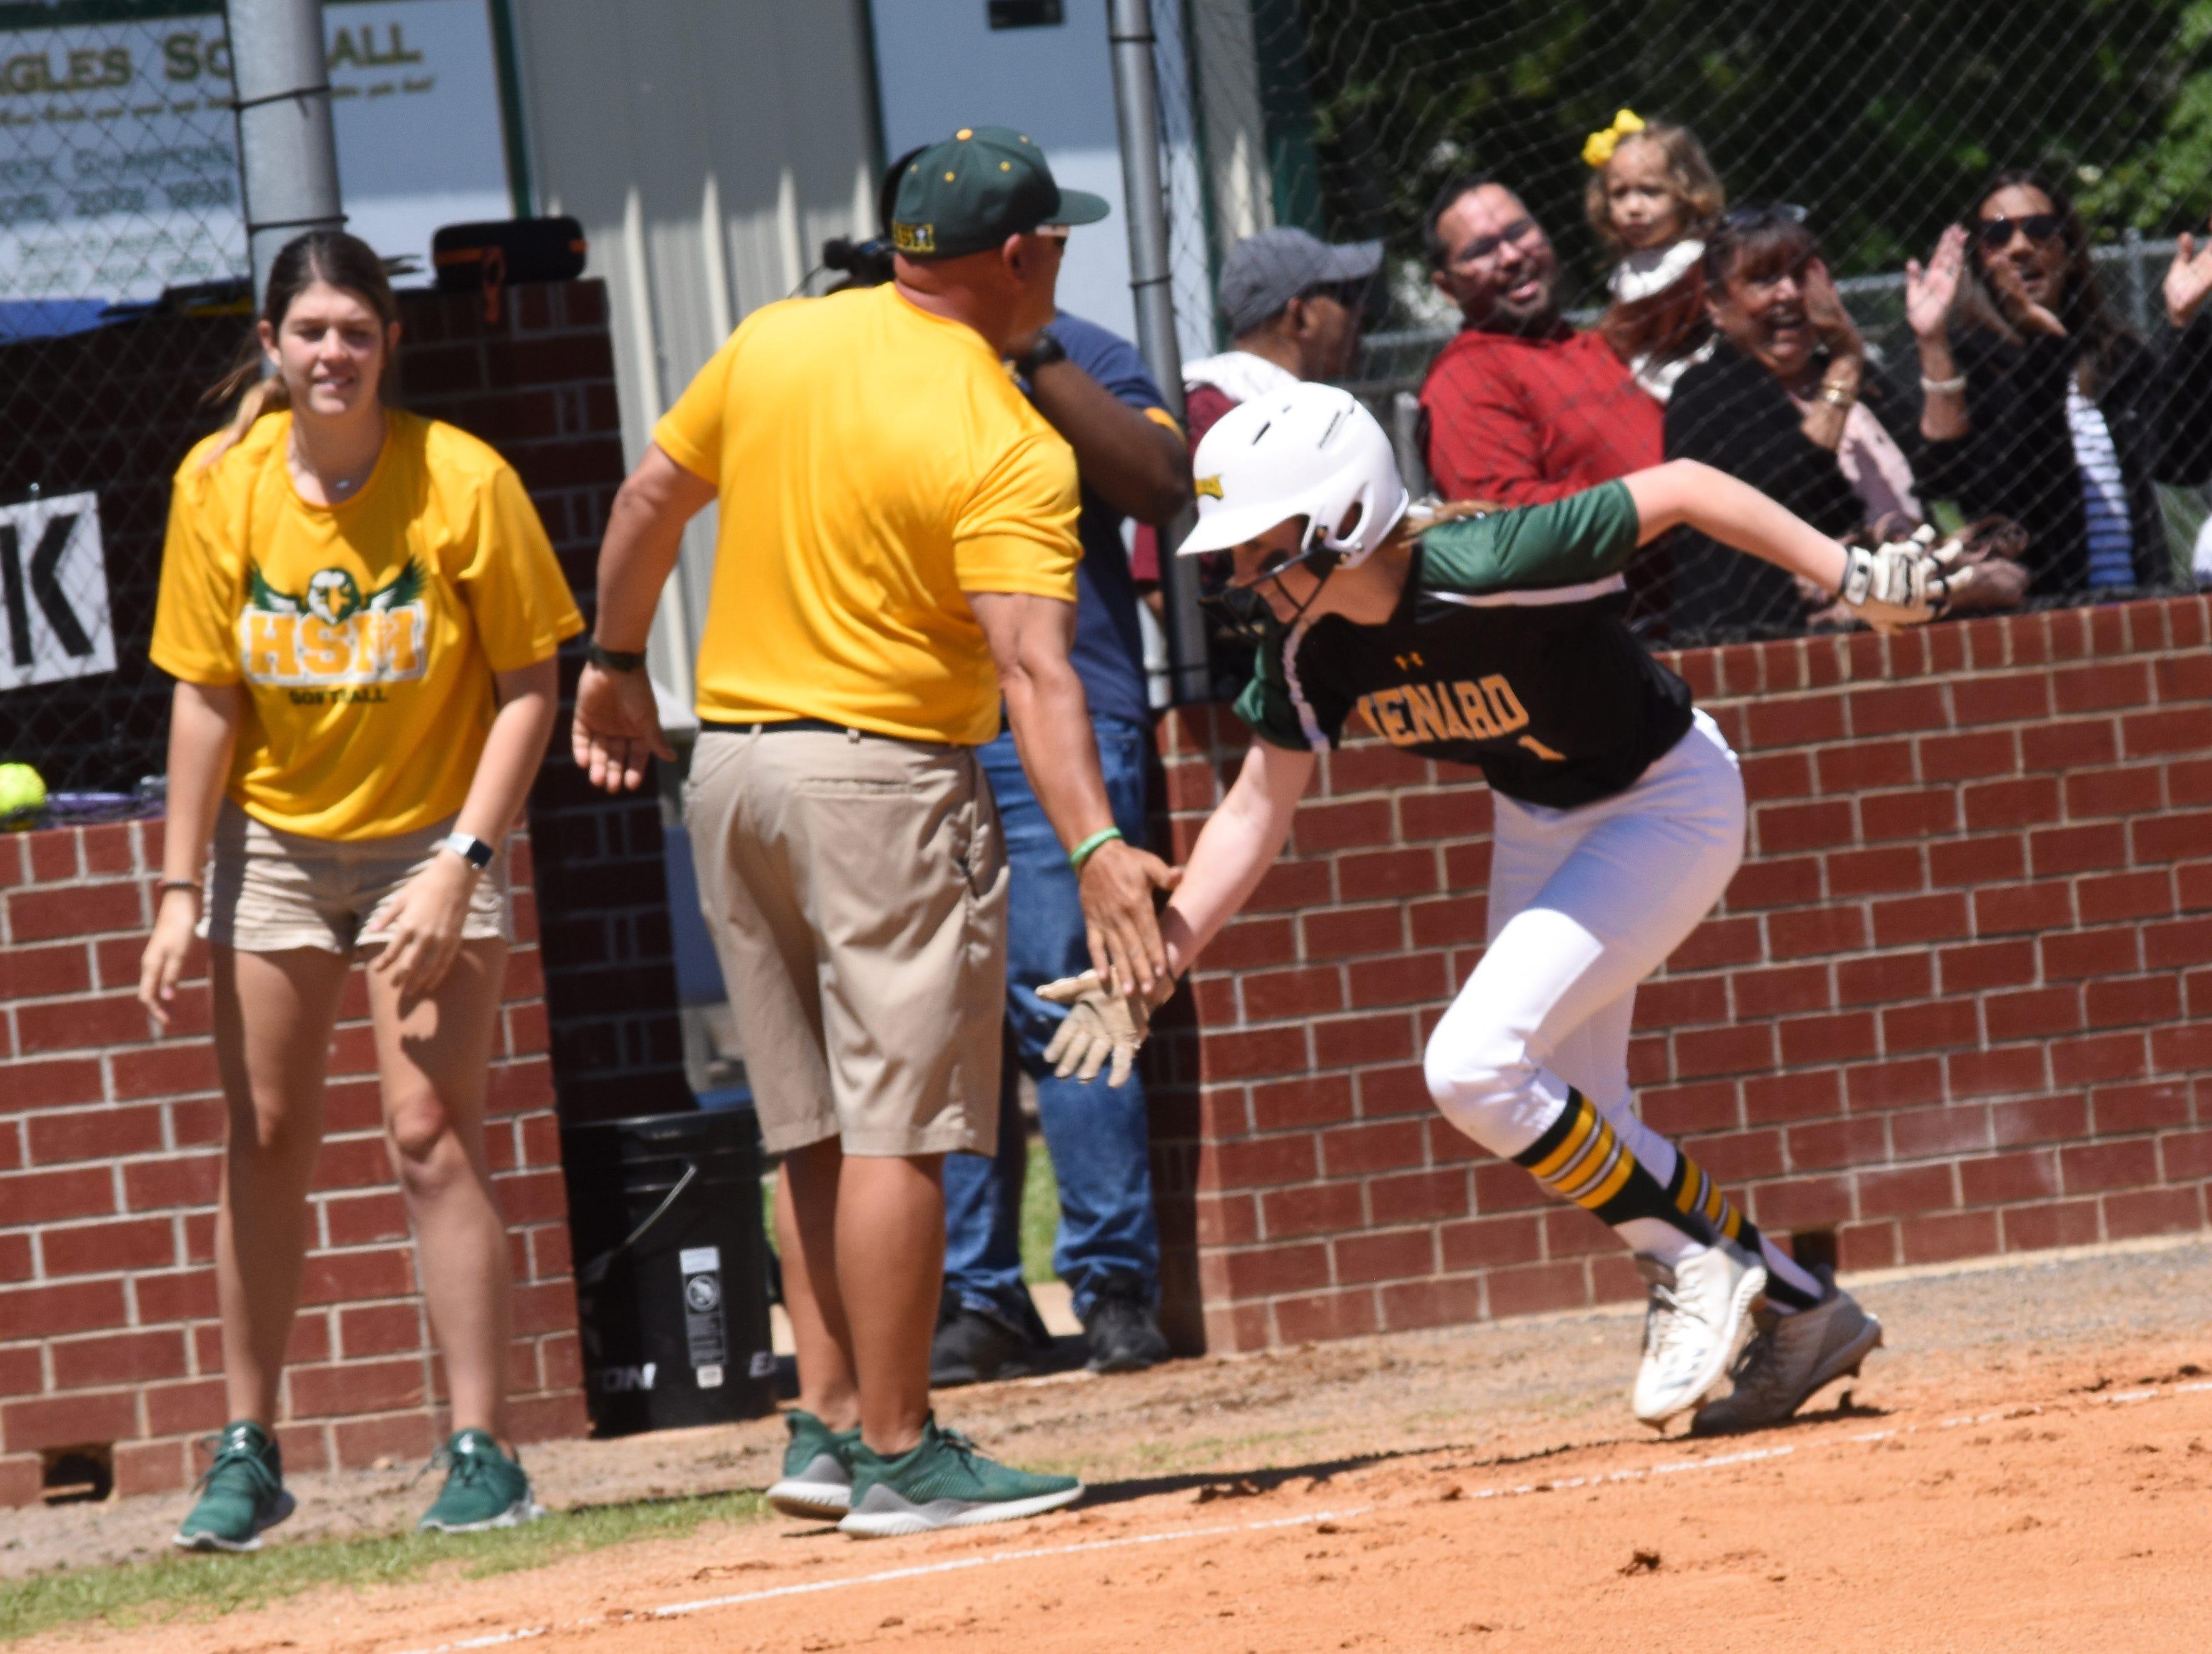 Holy Savior Menard High School vs. Northlake Christian High School Saturday, April 20, 2019 in the 2019 Allstate Sugar Bowl/LHSAA Softball State Tournament  Division III quarterfinals. Menard won 4-2.